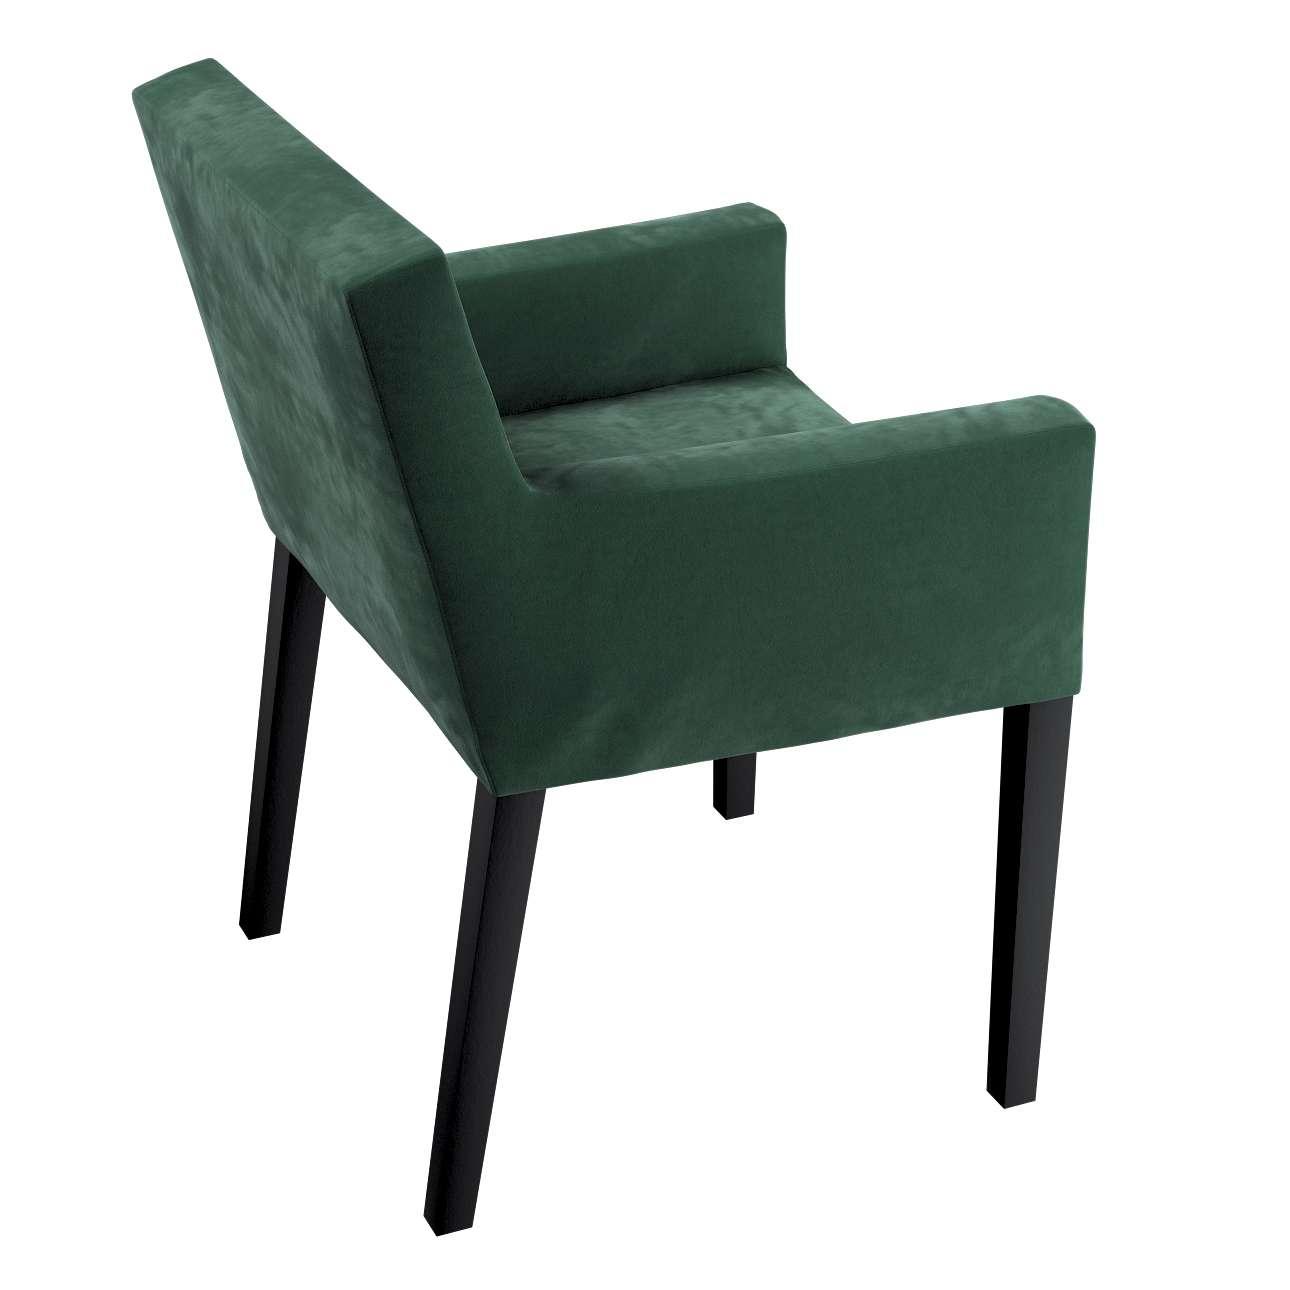 Návlek na stoličku s opierkami Nils V kolekcii Velvet, tkanina: 704-25